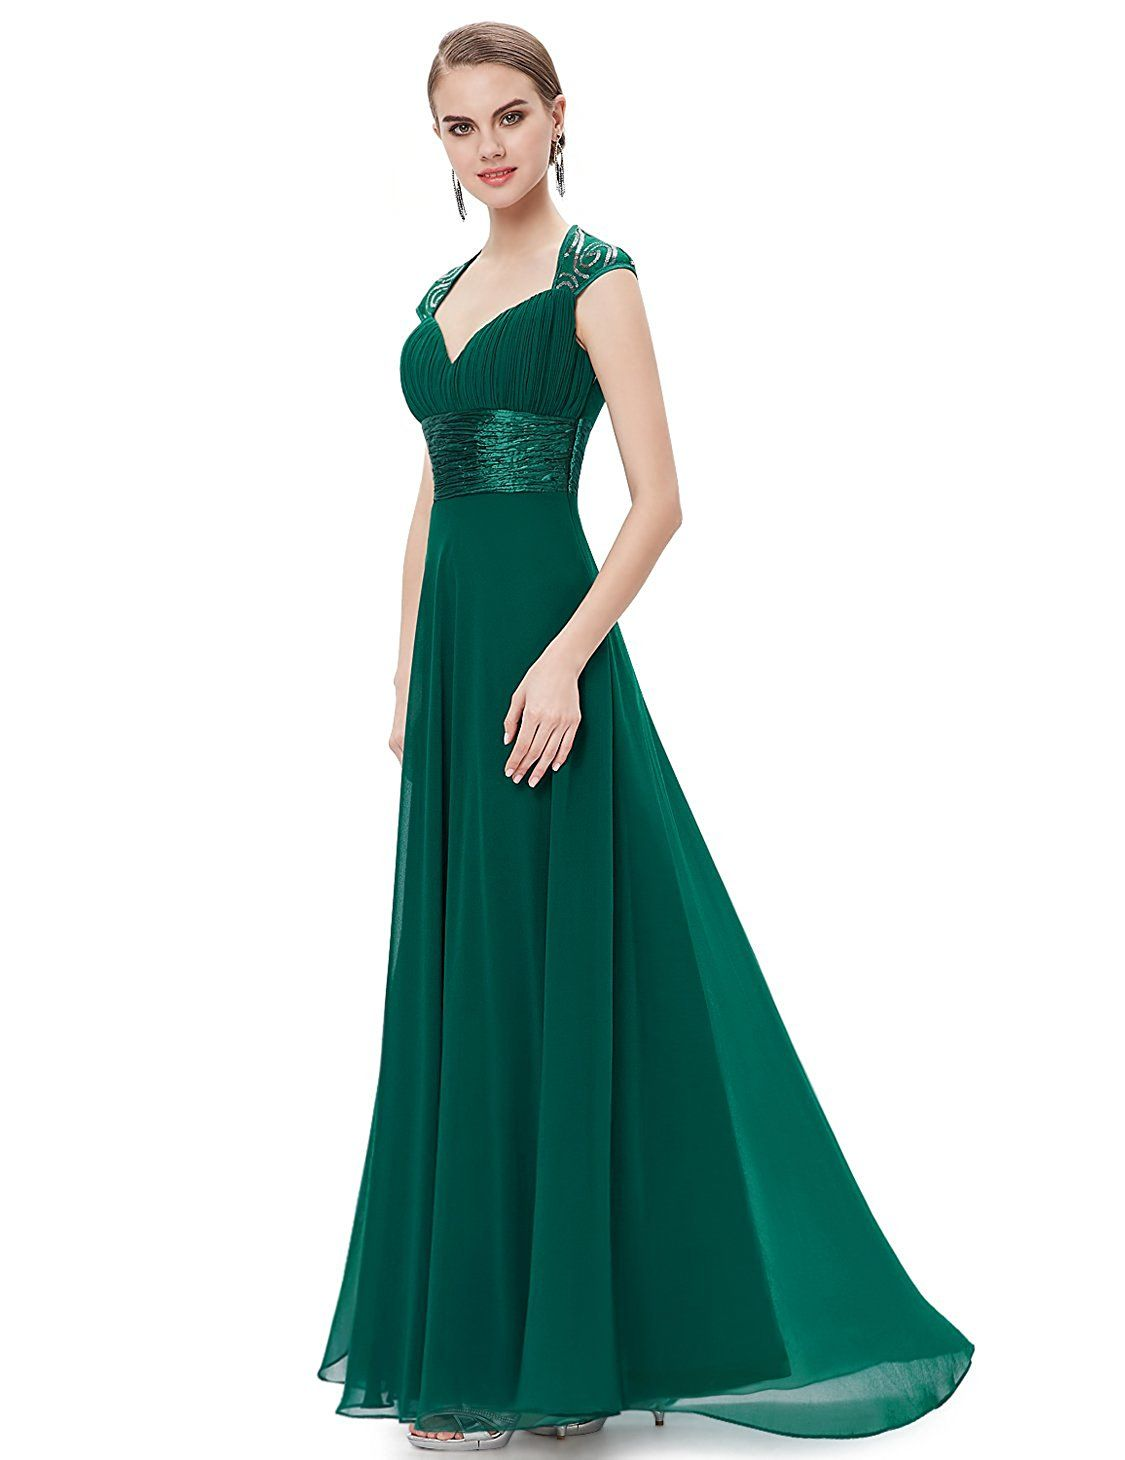 7ef828d8b45 Ever Pretty Chiffon Sexy V-neck Ruched Empire Line Evening Dress 09672